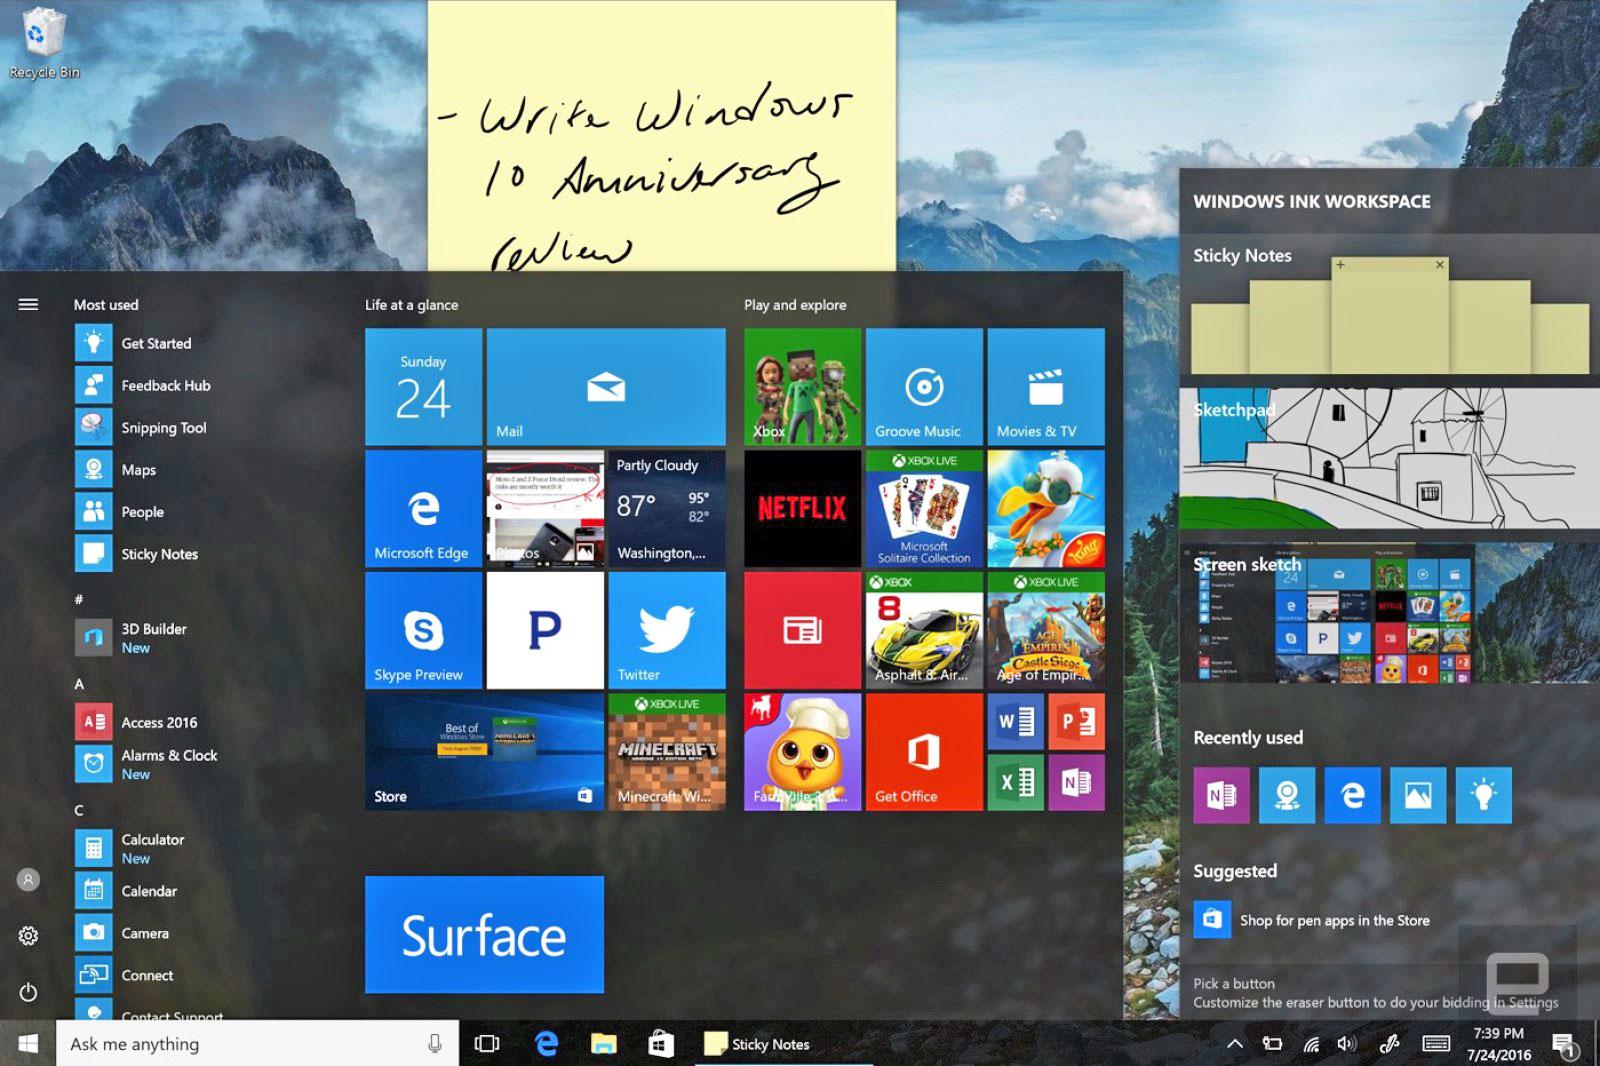 Windows 10 周年更新让它在许多小地方都变得更好了